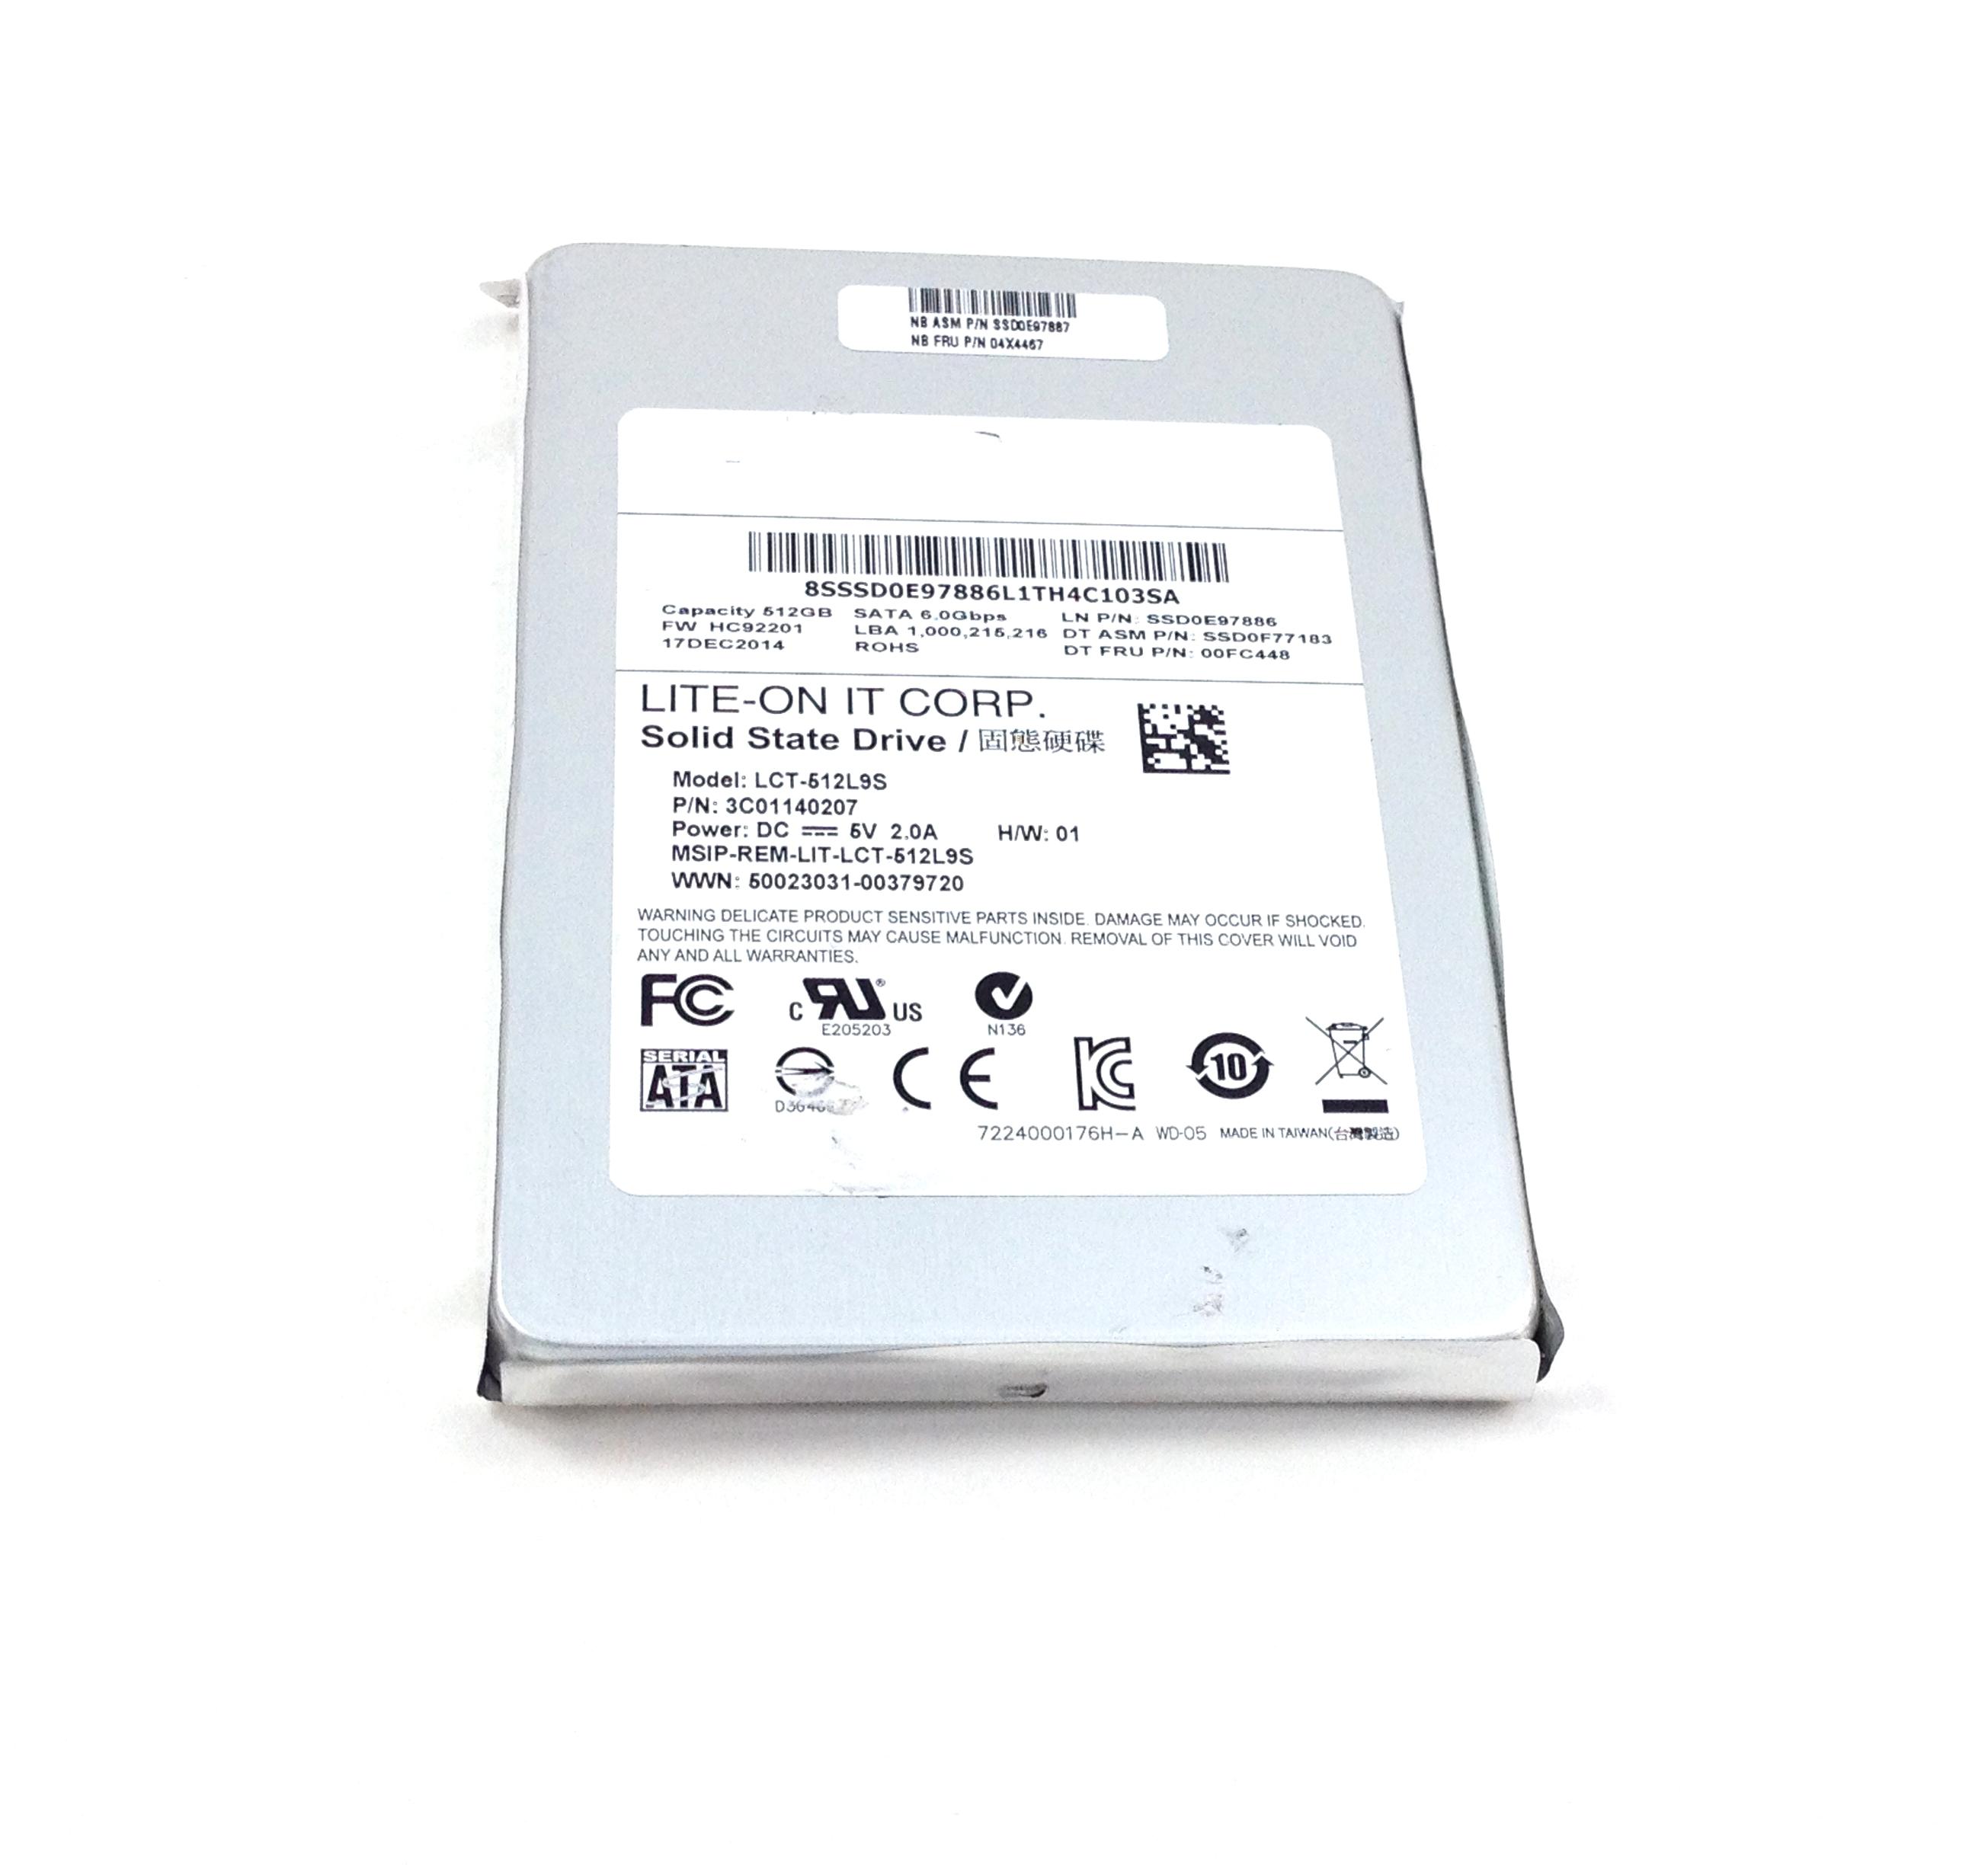 IBM LENOVO 512GB 6GBPS SATA 2.5'' SOLID STATE DRIVE (04X4467)